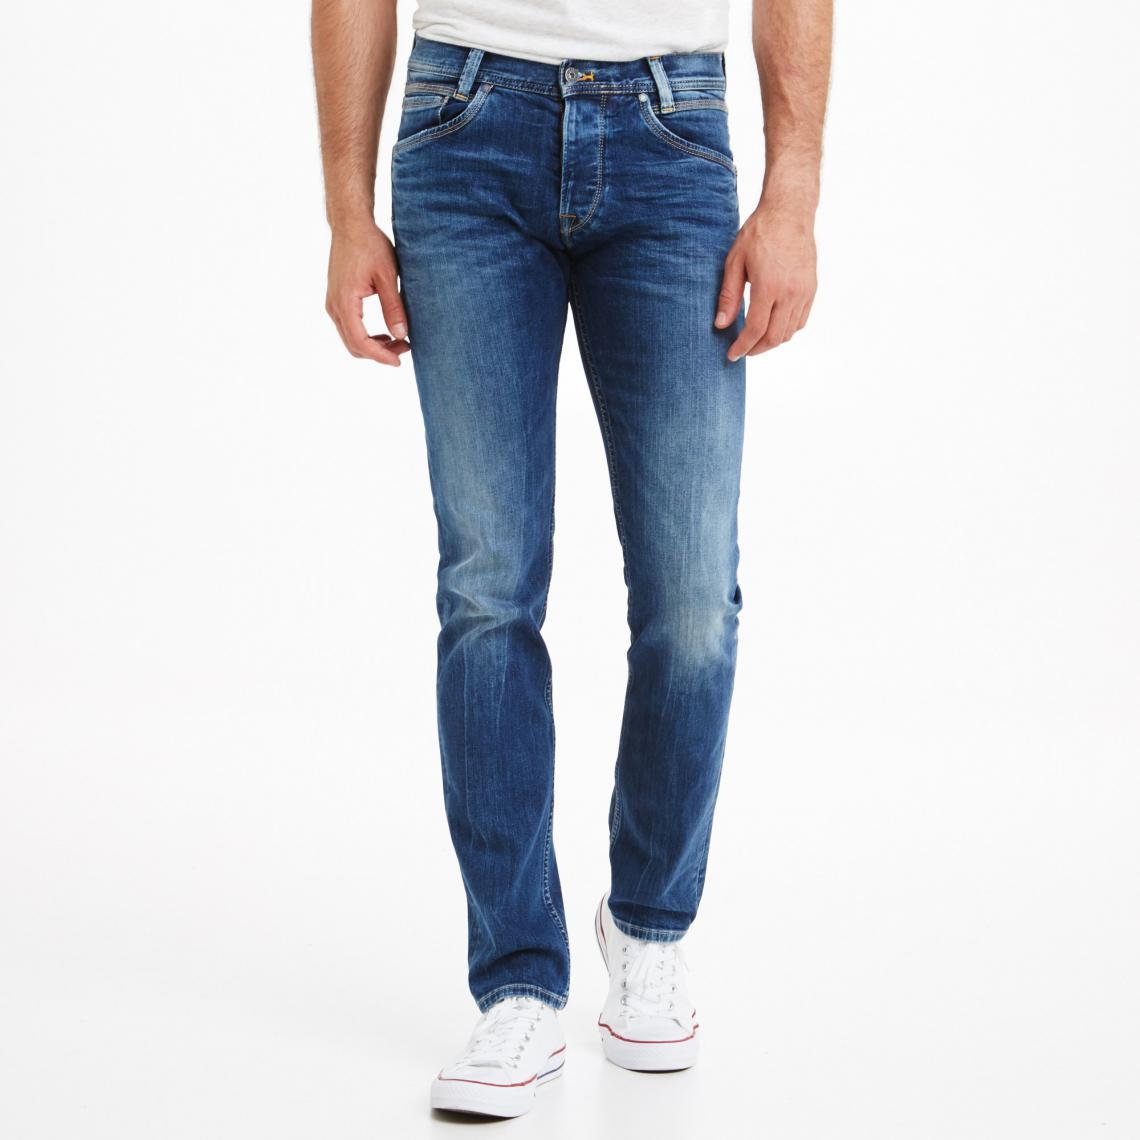 6004115f54f Jean regular slim L32 Spike homme Pepe Jeans - 11OZ STREAKY STRETCH MED Pepe  Jeans